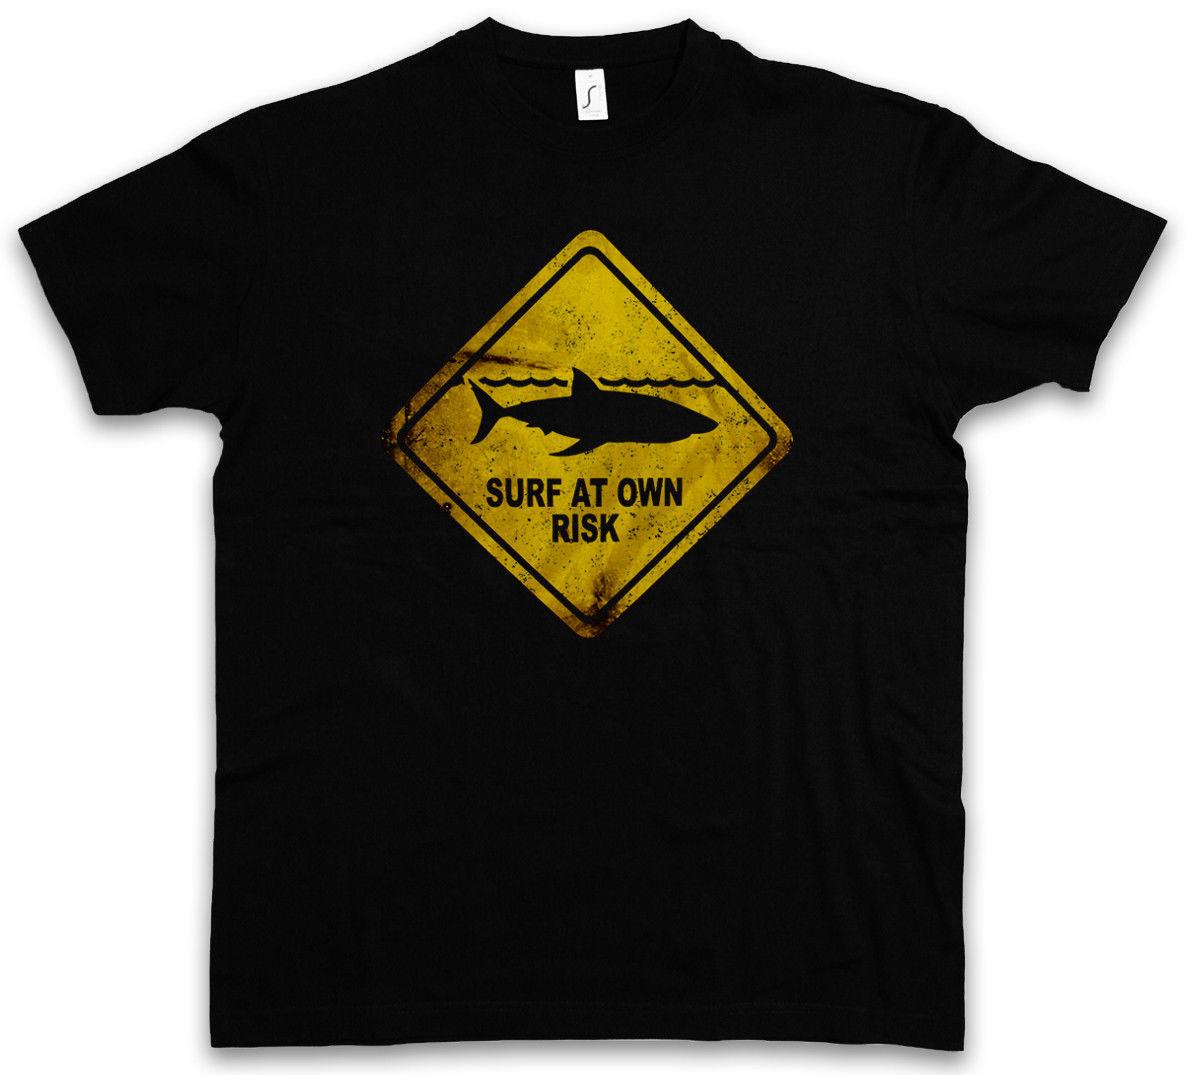 Акула предупреждающий знак футболка Surfer Diver taucher челюсти тигр белый убийца